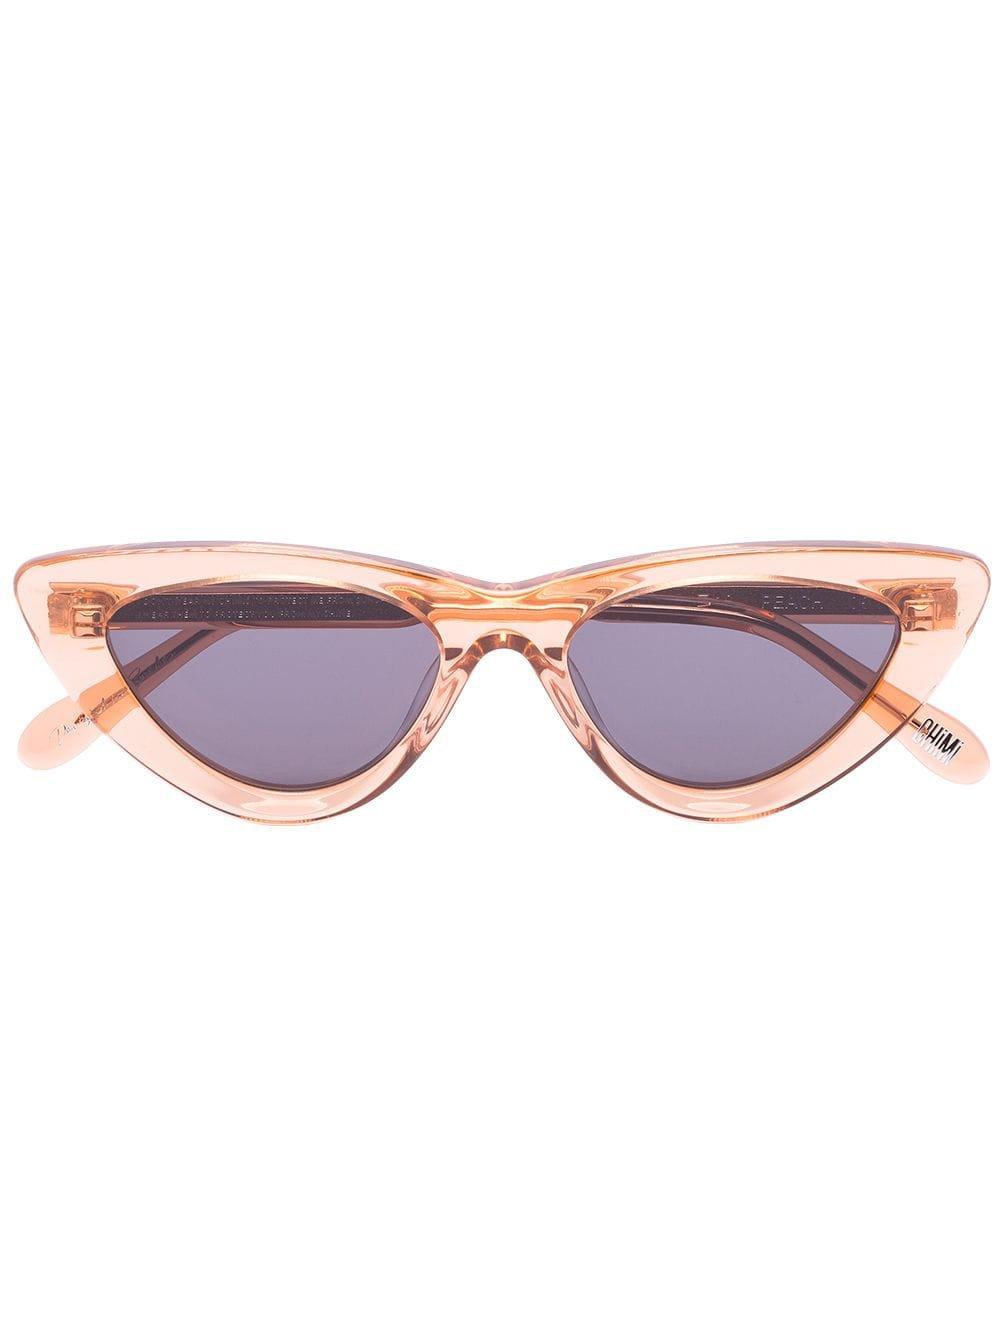 Chimi Peach Cat Eye Sunglasses - Farfetch